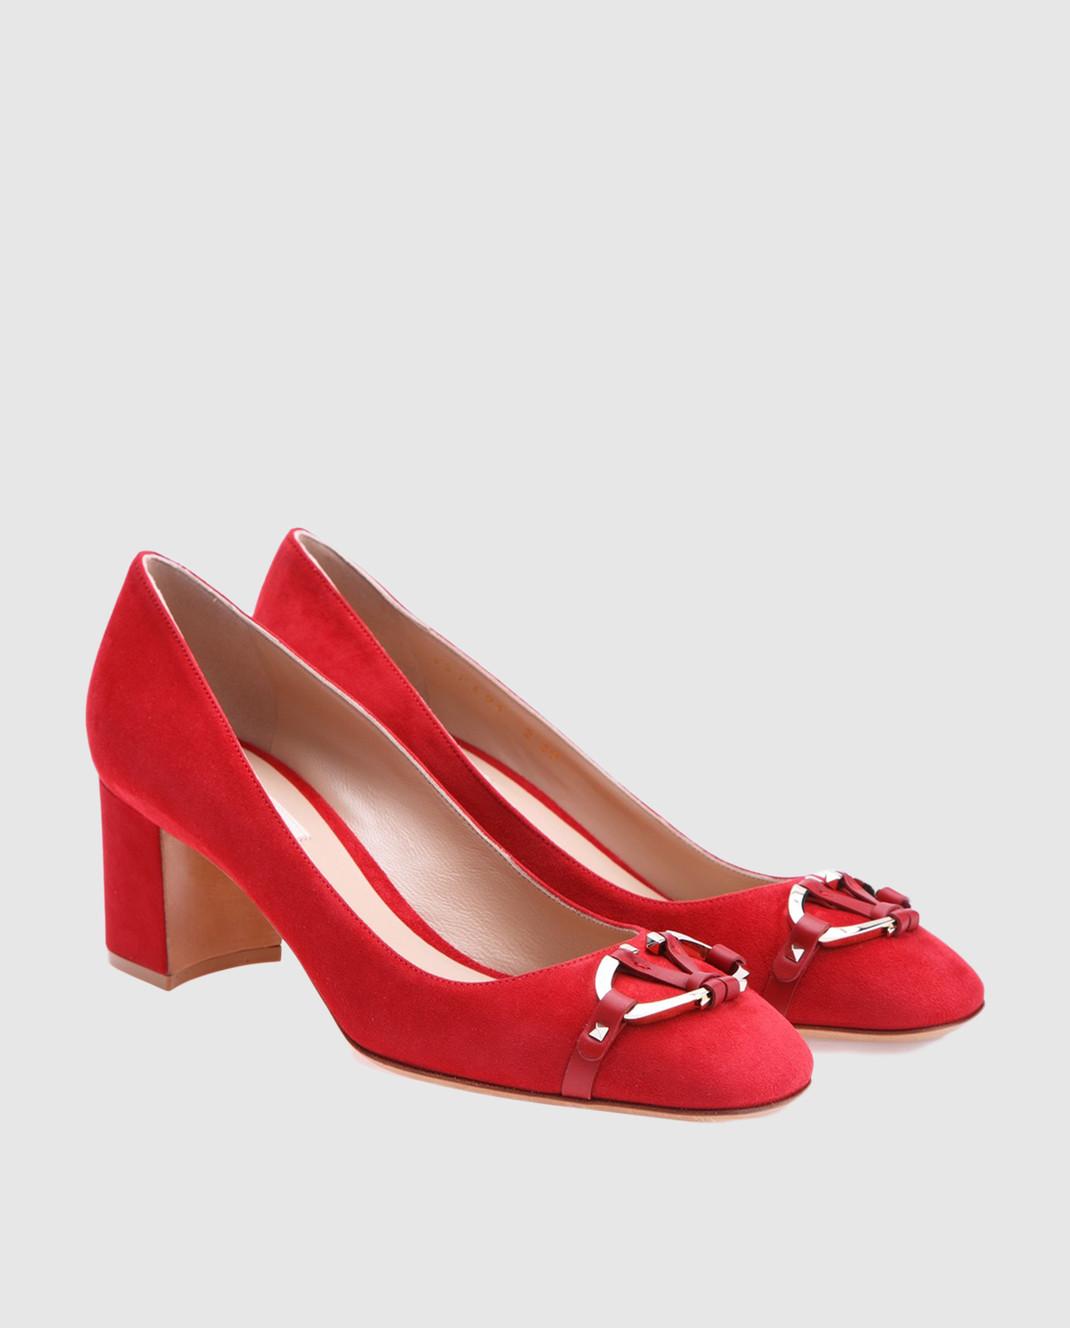 Valentino Красные туфли из замши PW2S0E93ZUR изображение 2